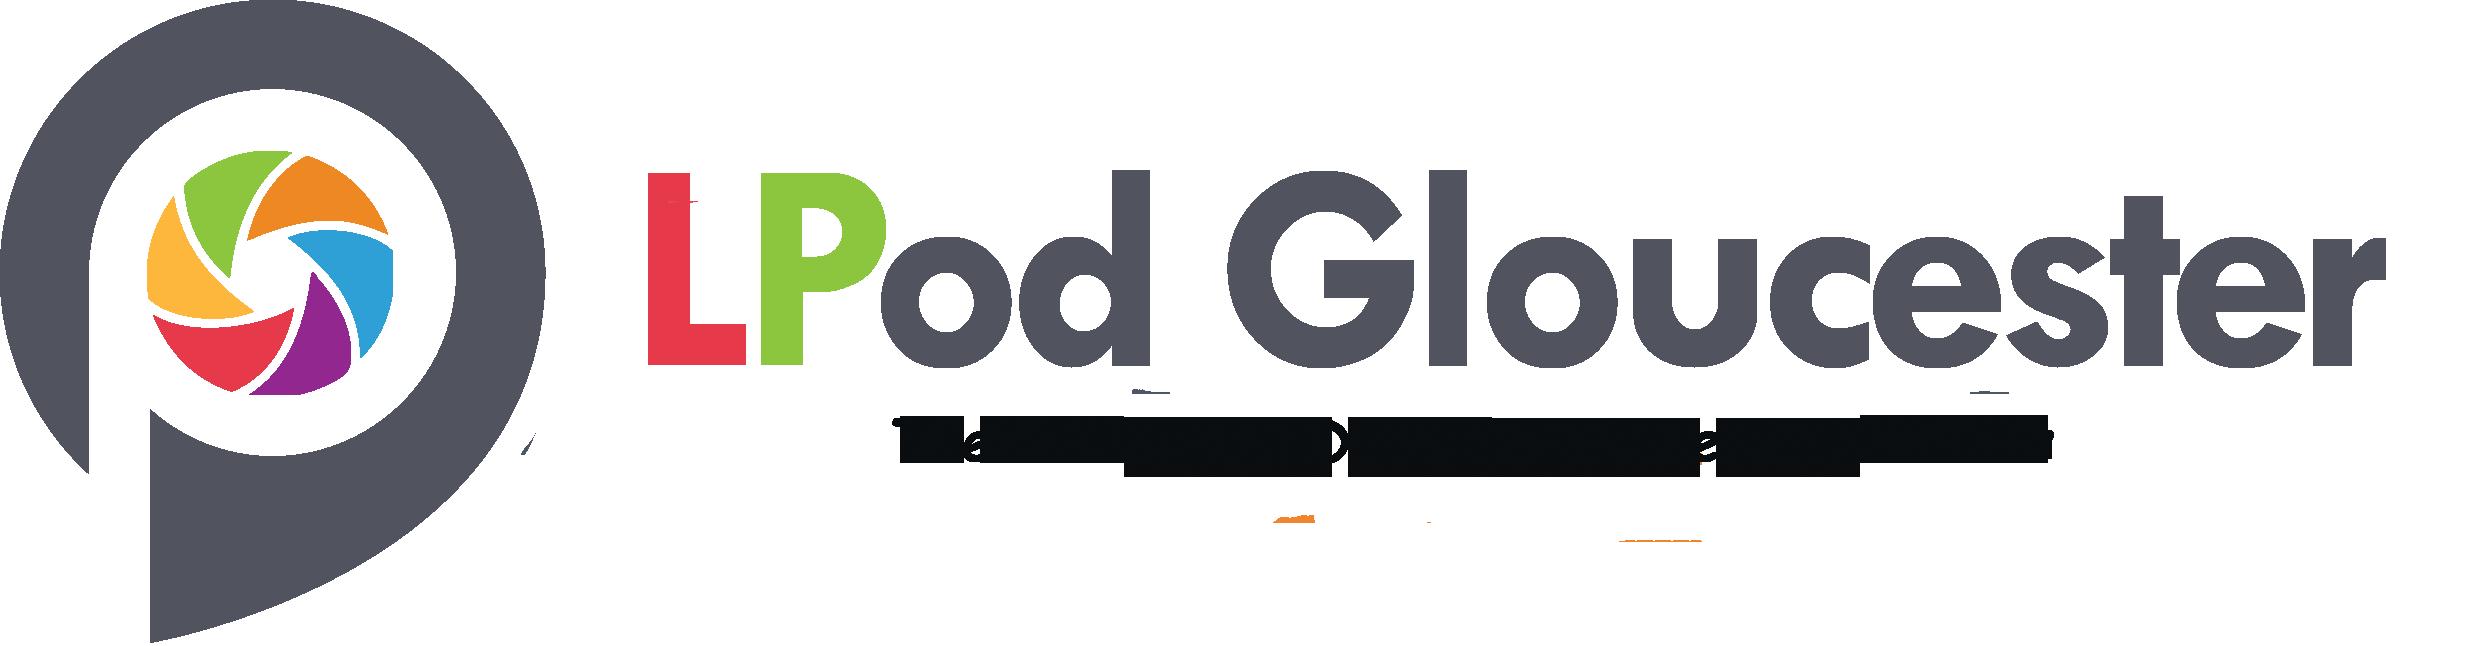 intensive driving courses glocuester, intensive driving school gloucester